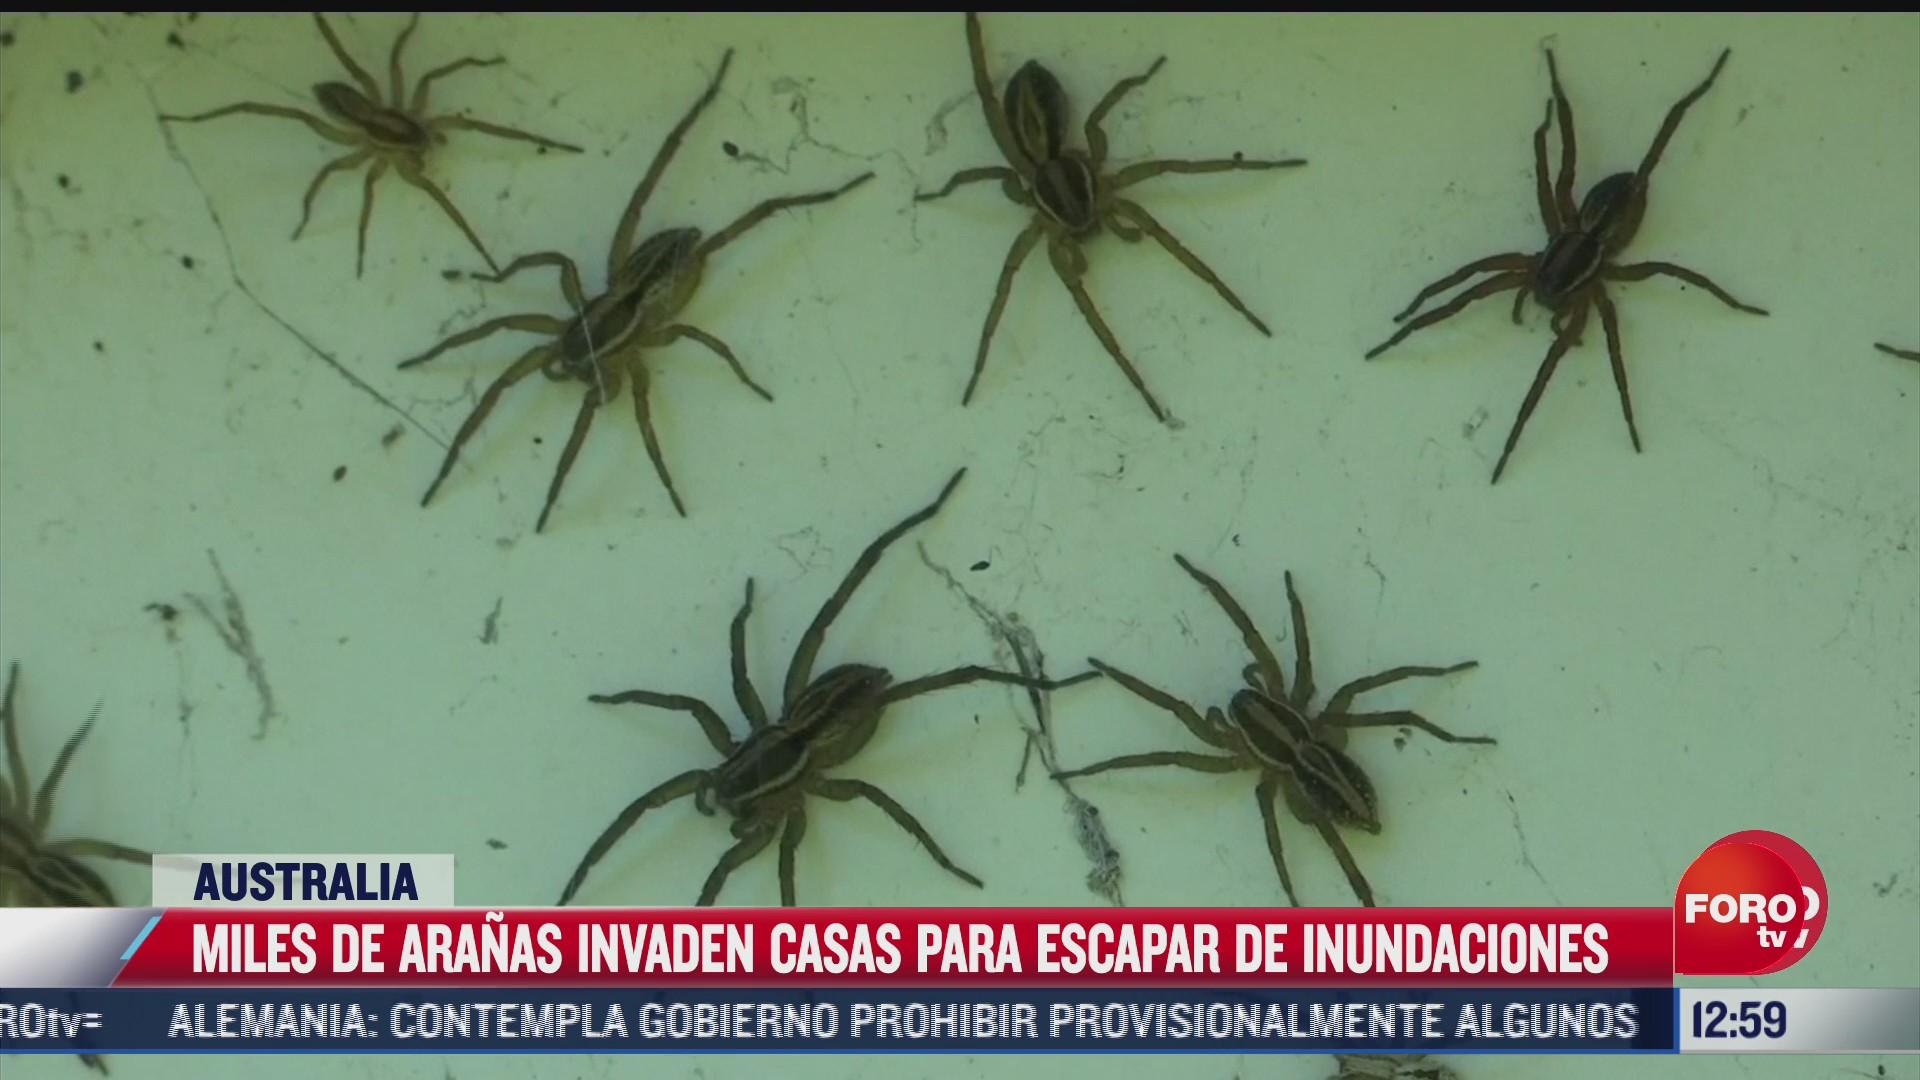 miles de aranas invaden residencias en australia